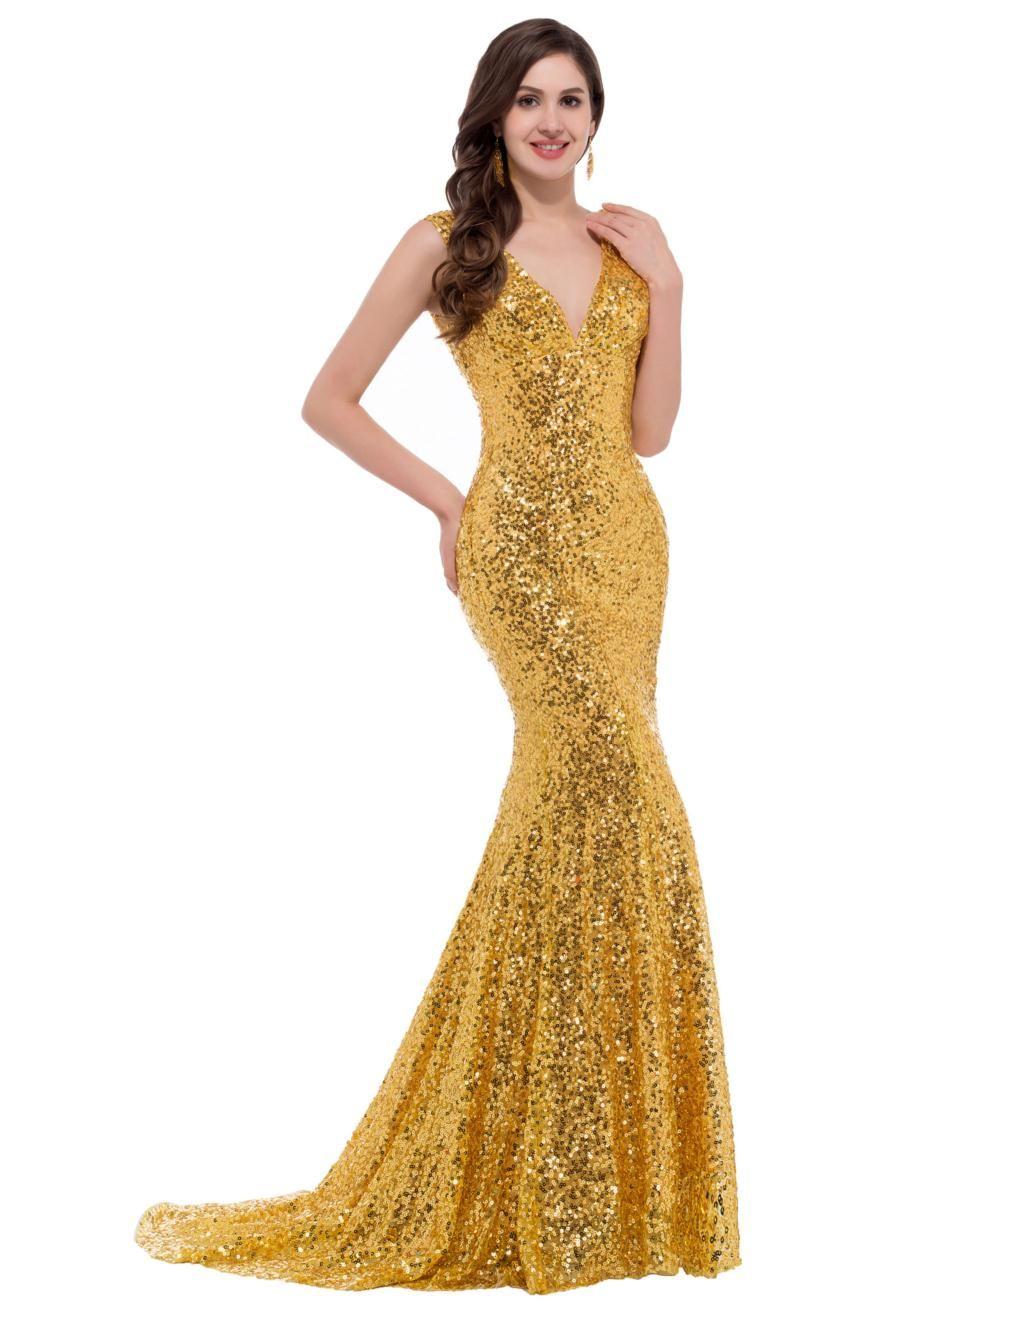 Evening wedding guest dresses  Gold sequin evening dress  Color dress  Pinterest  Wedding guest